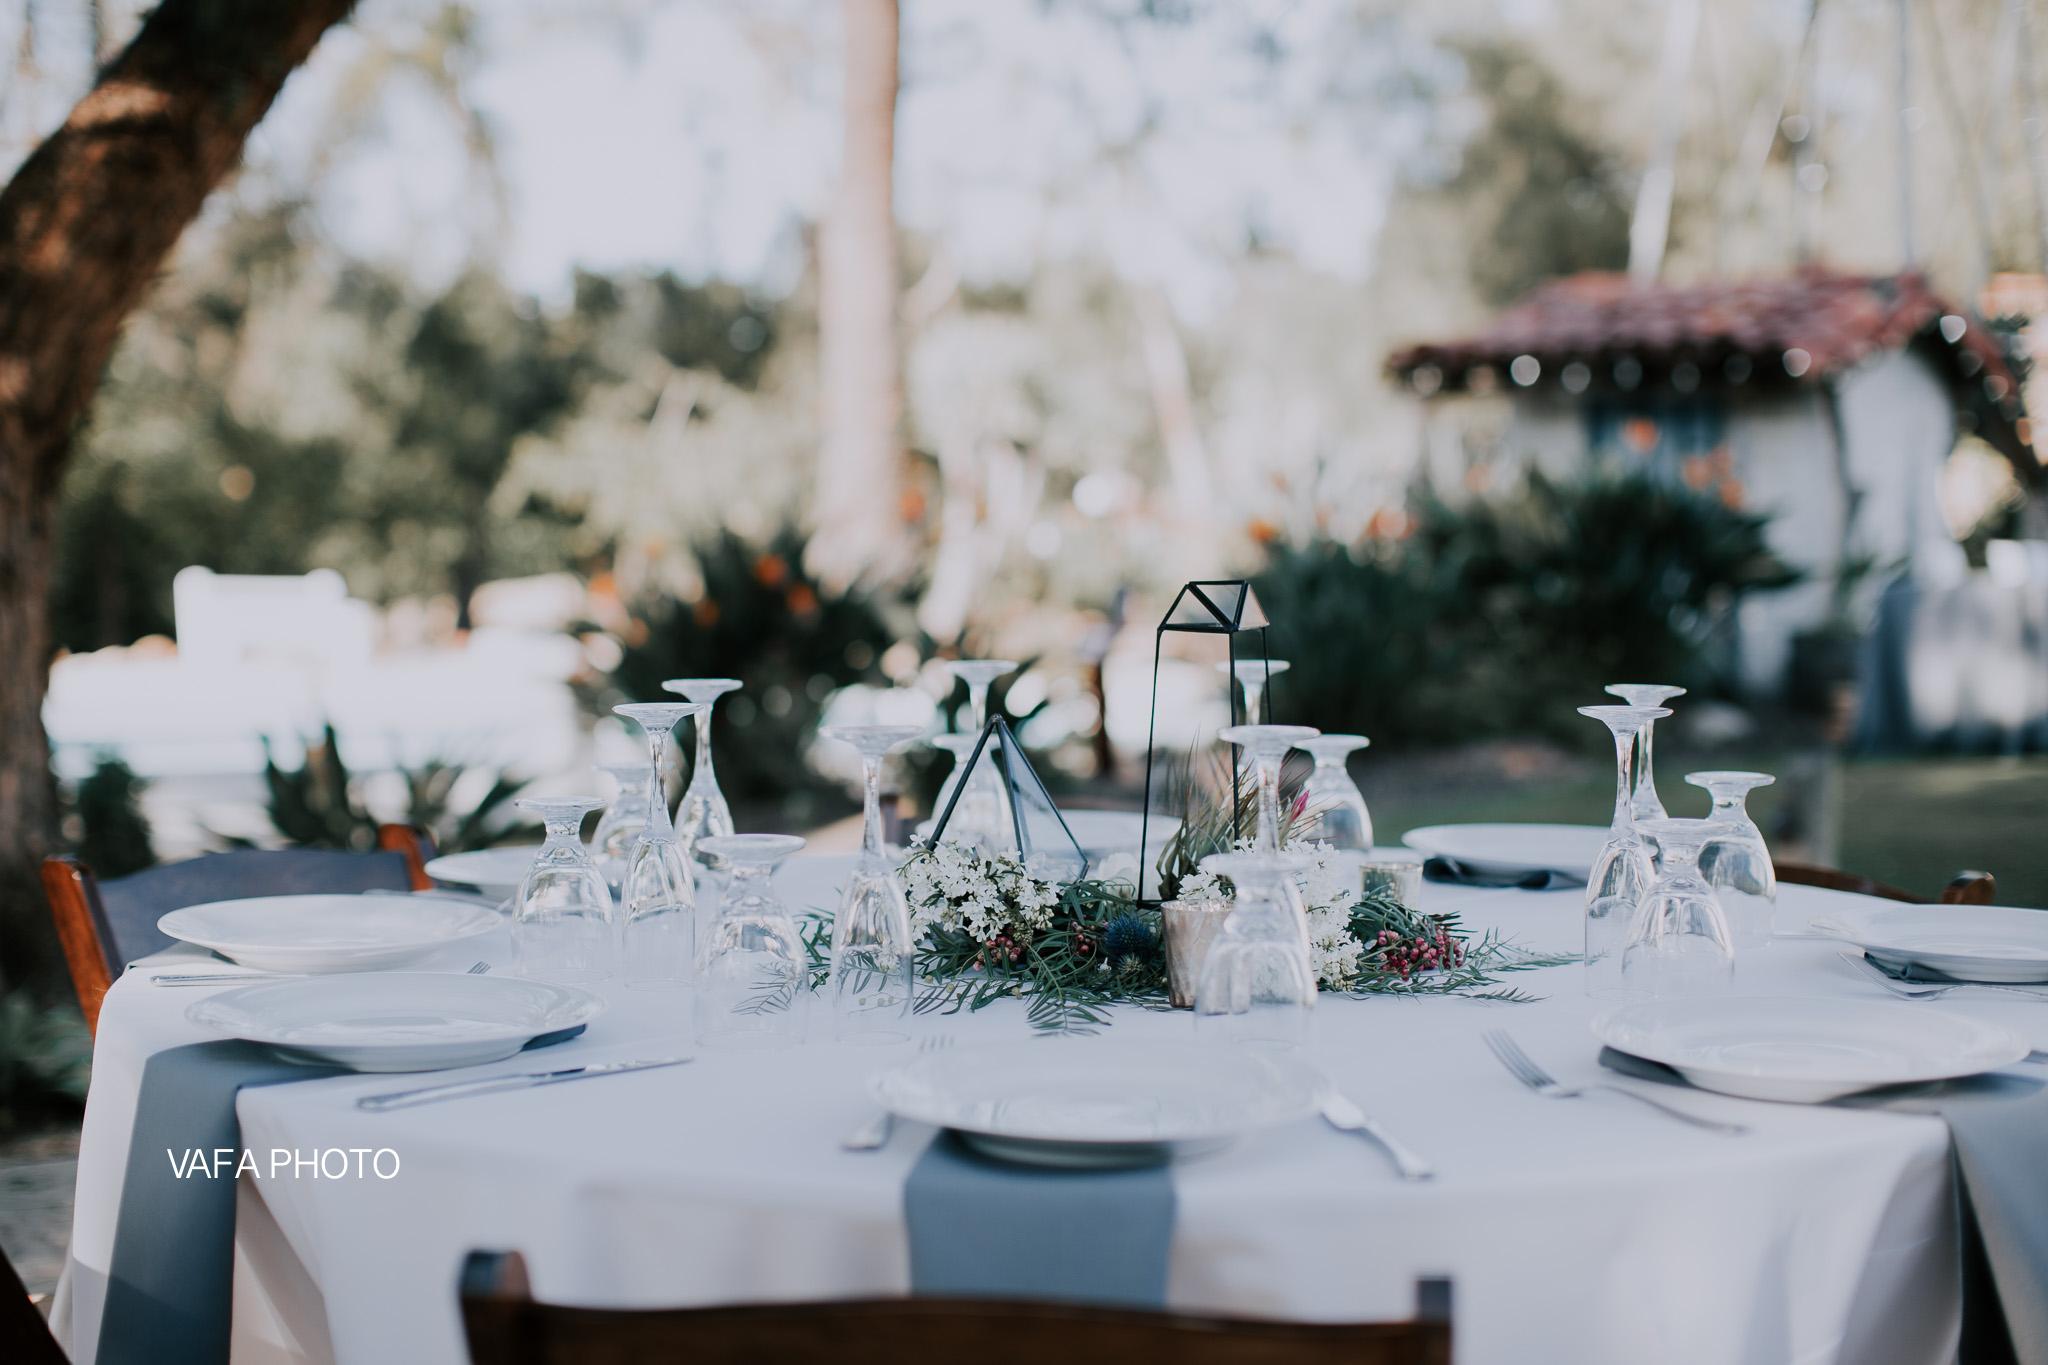 Leo-Carrillo-Ranch-Wedding-Lauren-Mike-Vafa-Photo-410.jpg